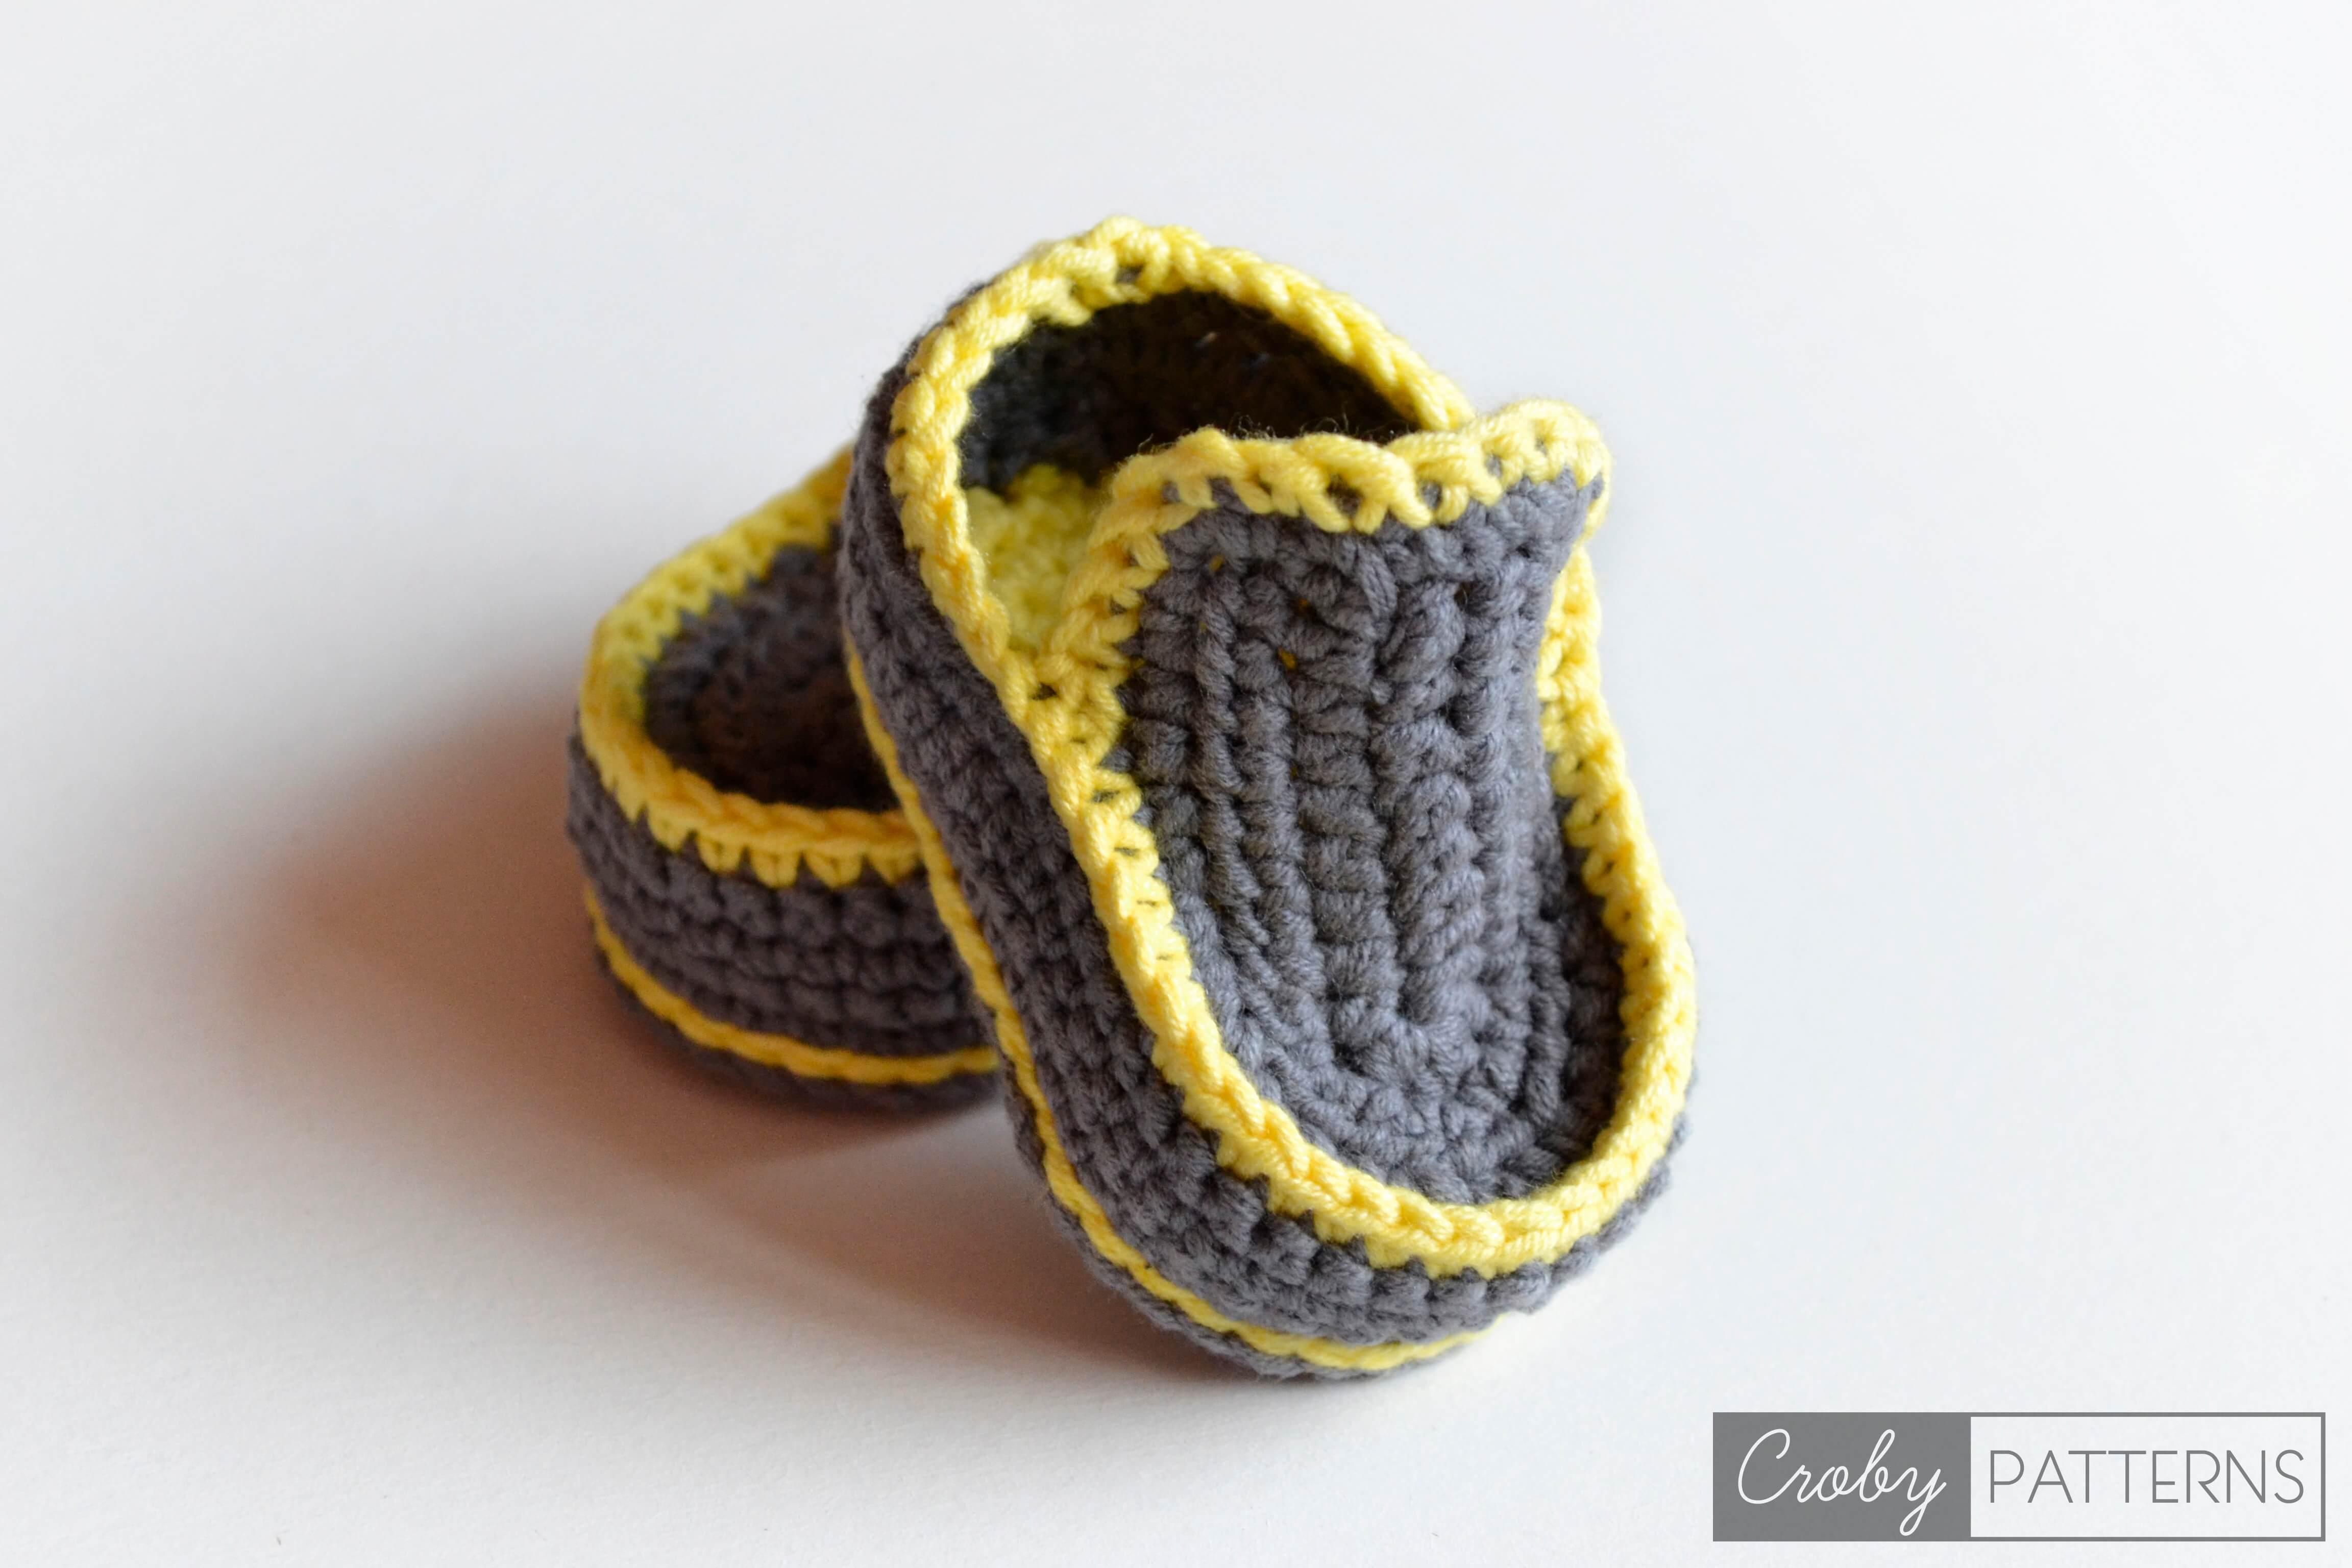 Httpscrobypatternsorange Pumpkin Crochet Baby Flats 2015 04